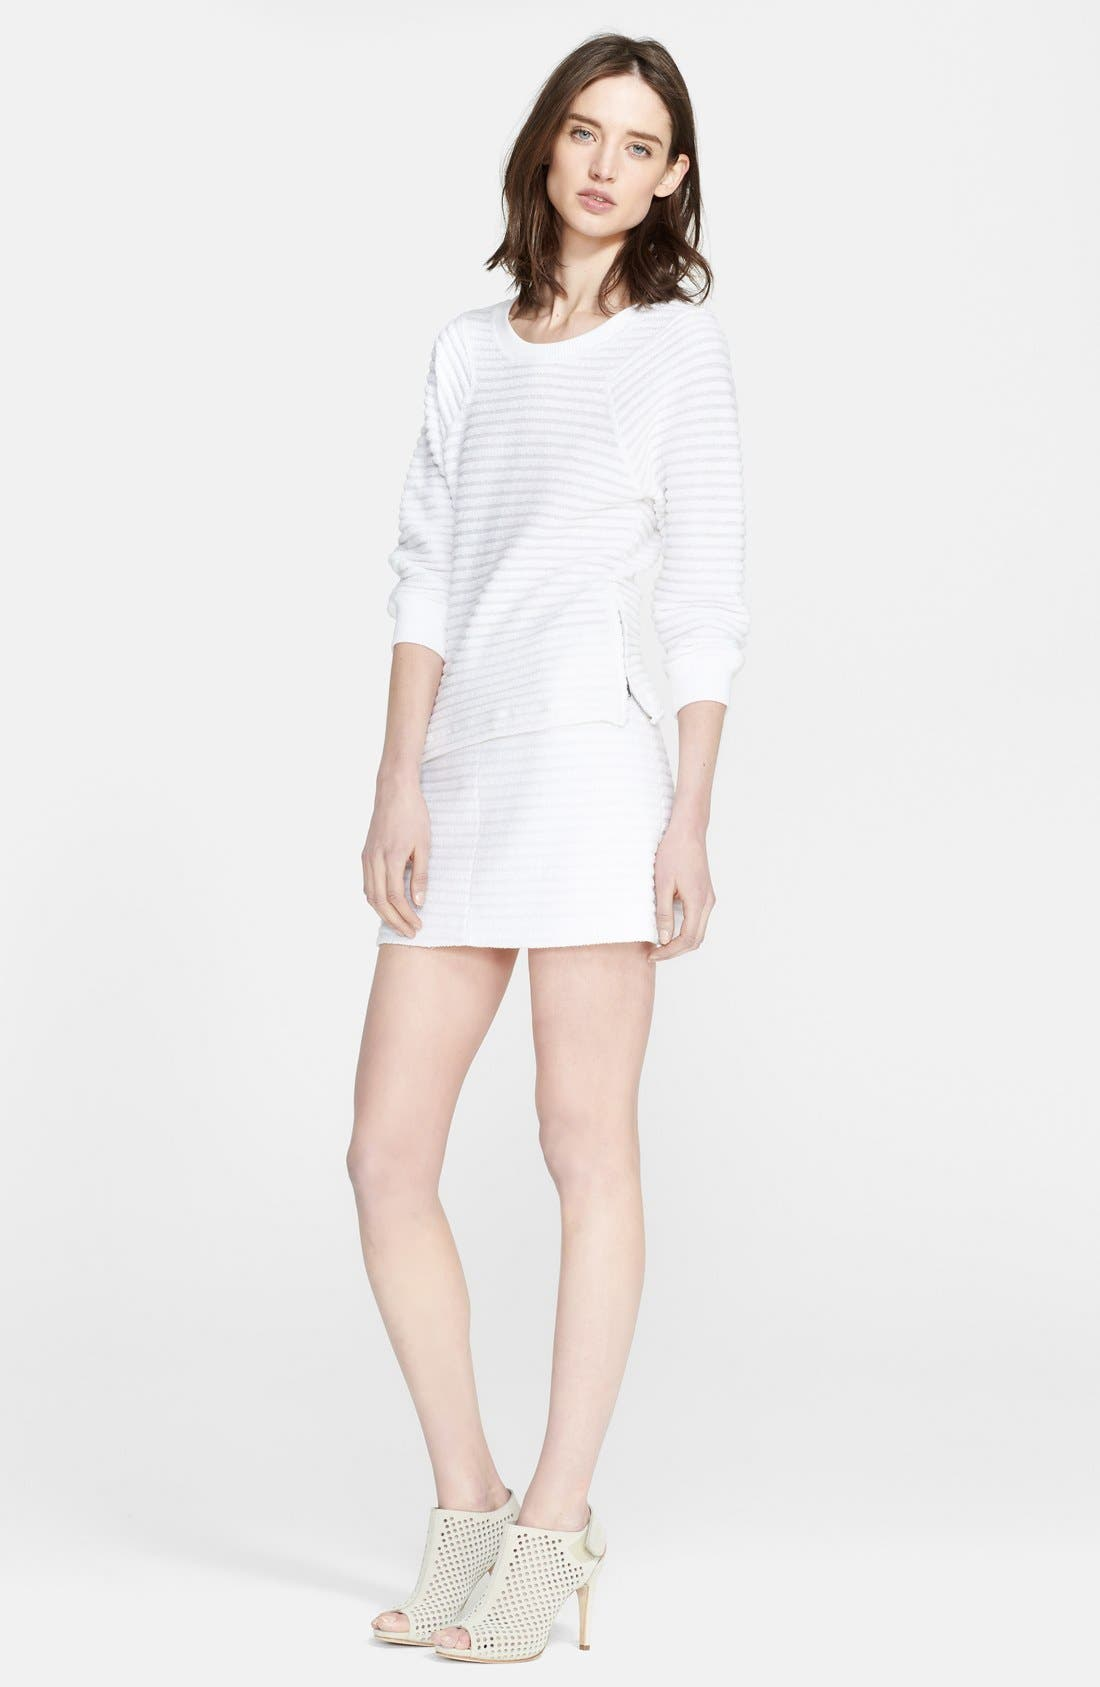 Main Image - Theory 'Ebro' Cotton Blend Sweatshirt